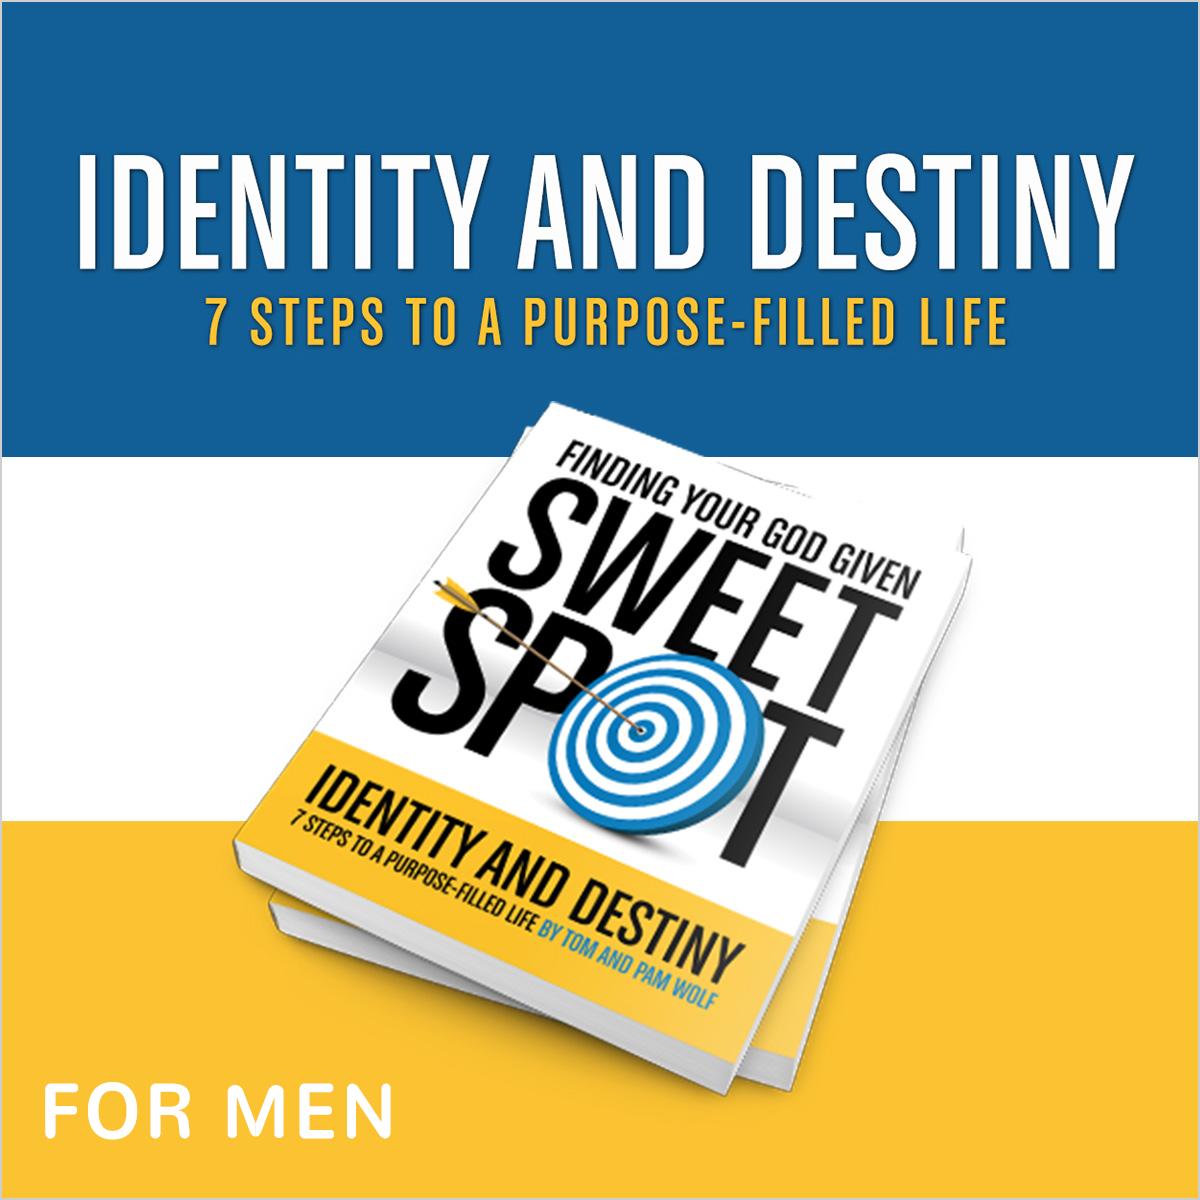 IDENTITY & DESTINY FOR MEN